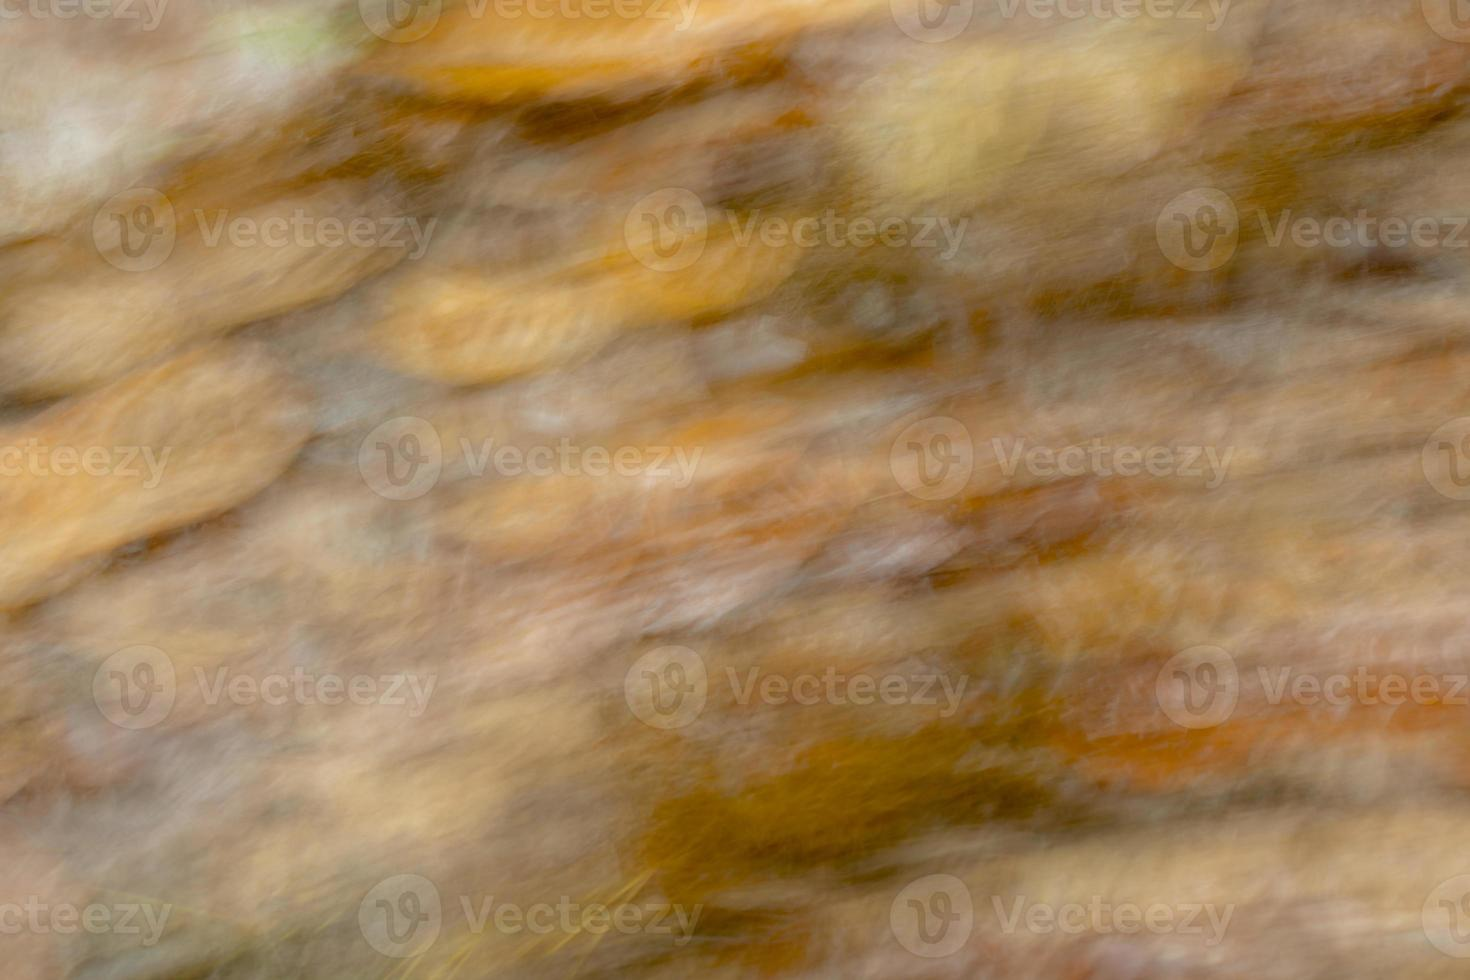 fundo desfocado de cores marrons outonais brilhantes foto